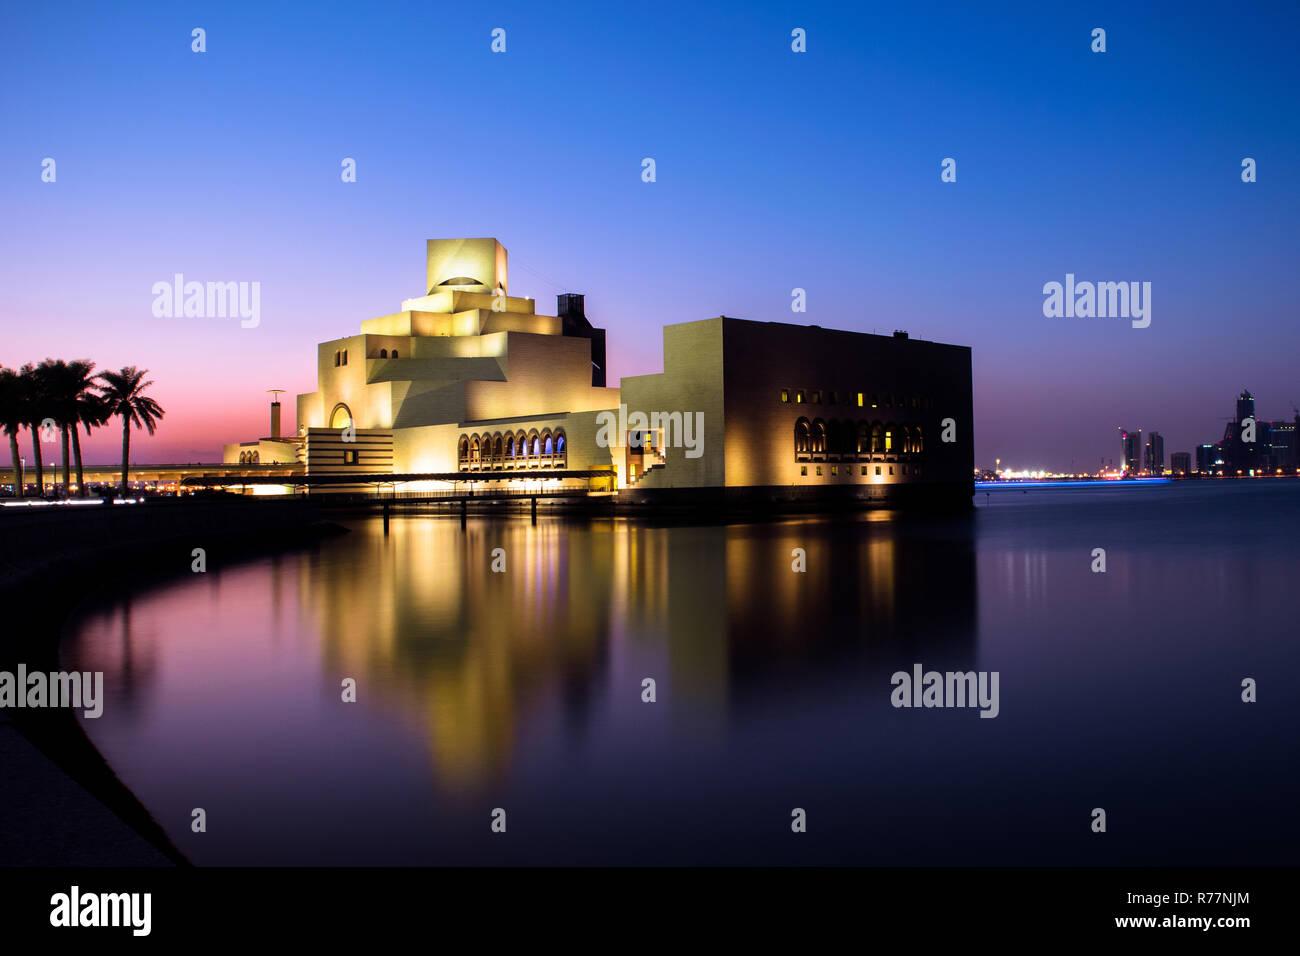 The Islamic museum in Qatar - Stock Image